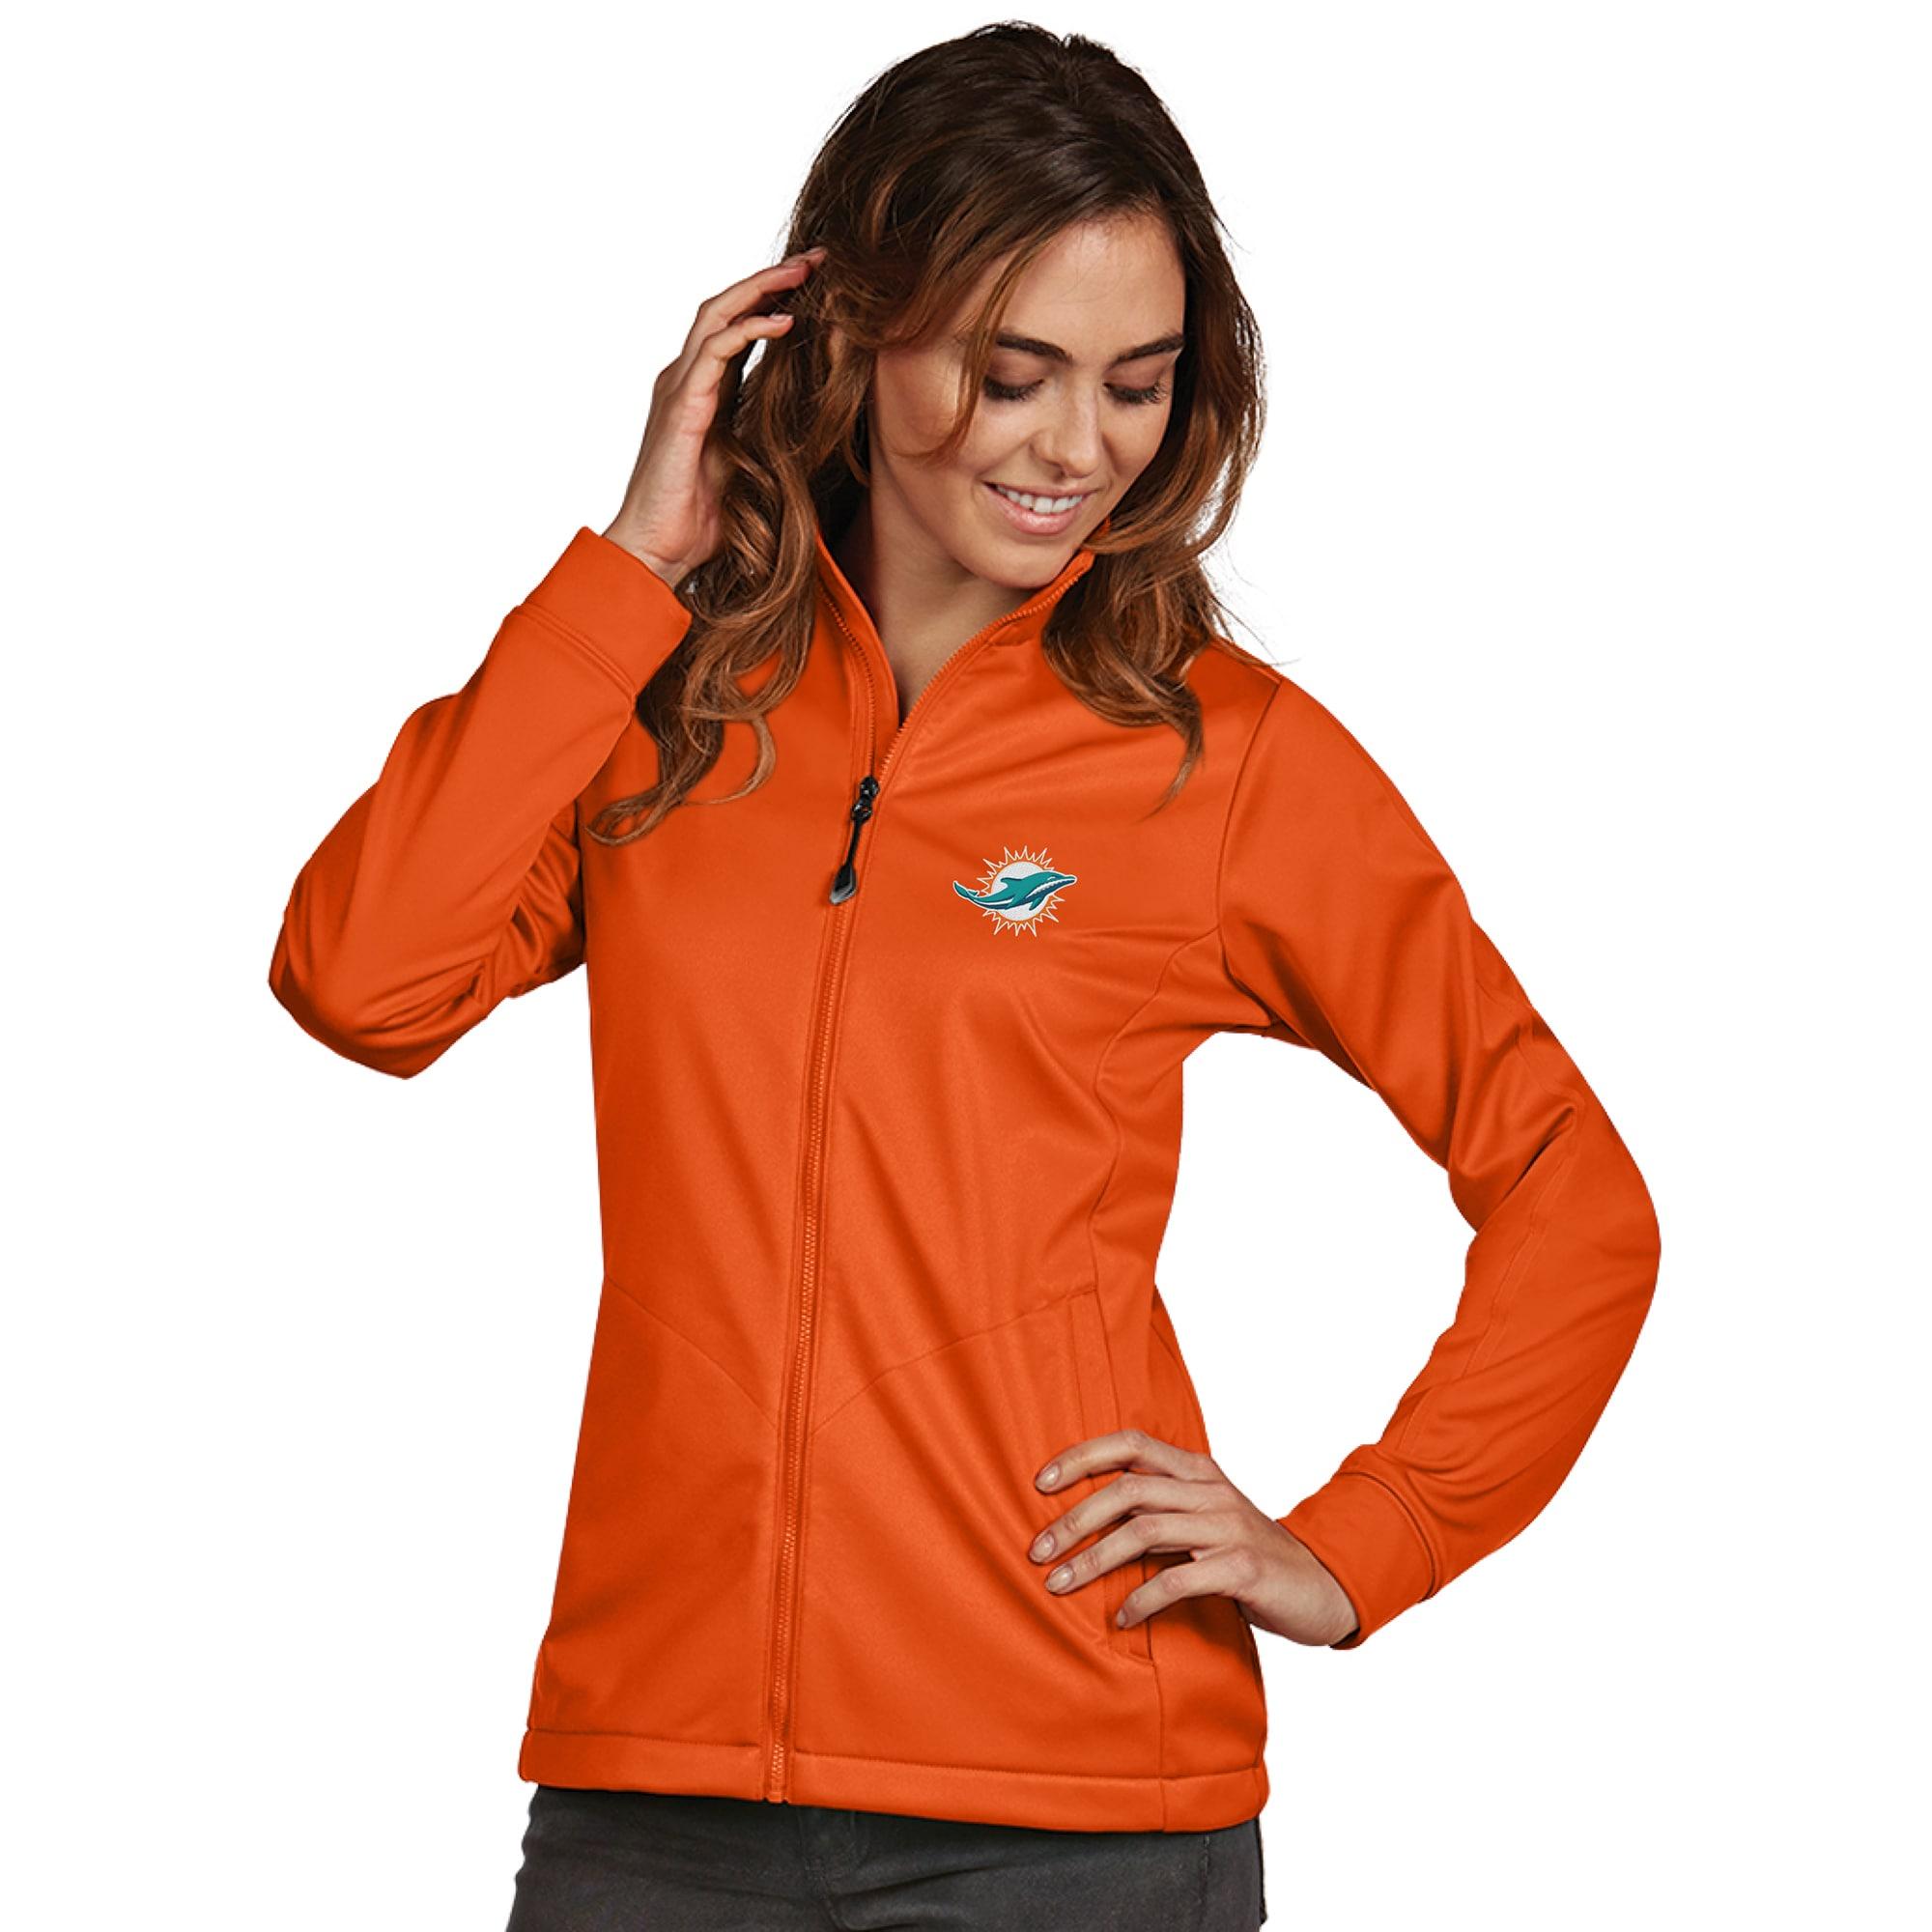 Miami Dolphins Women's Antigua Full-Zip Golf Jacket - Orange